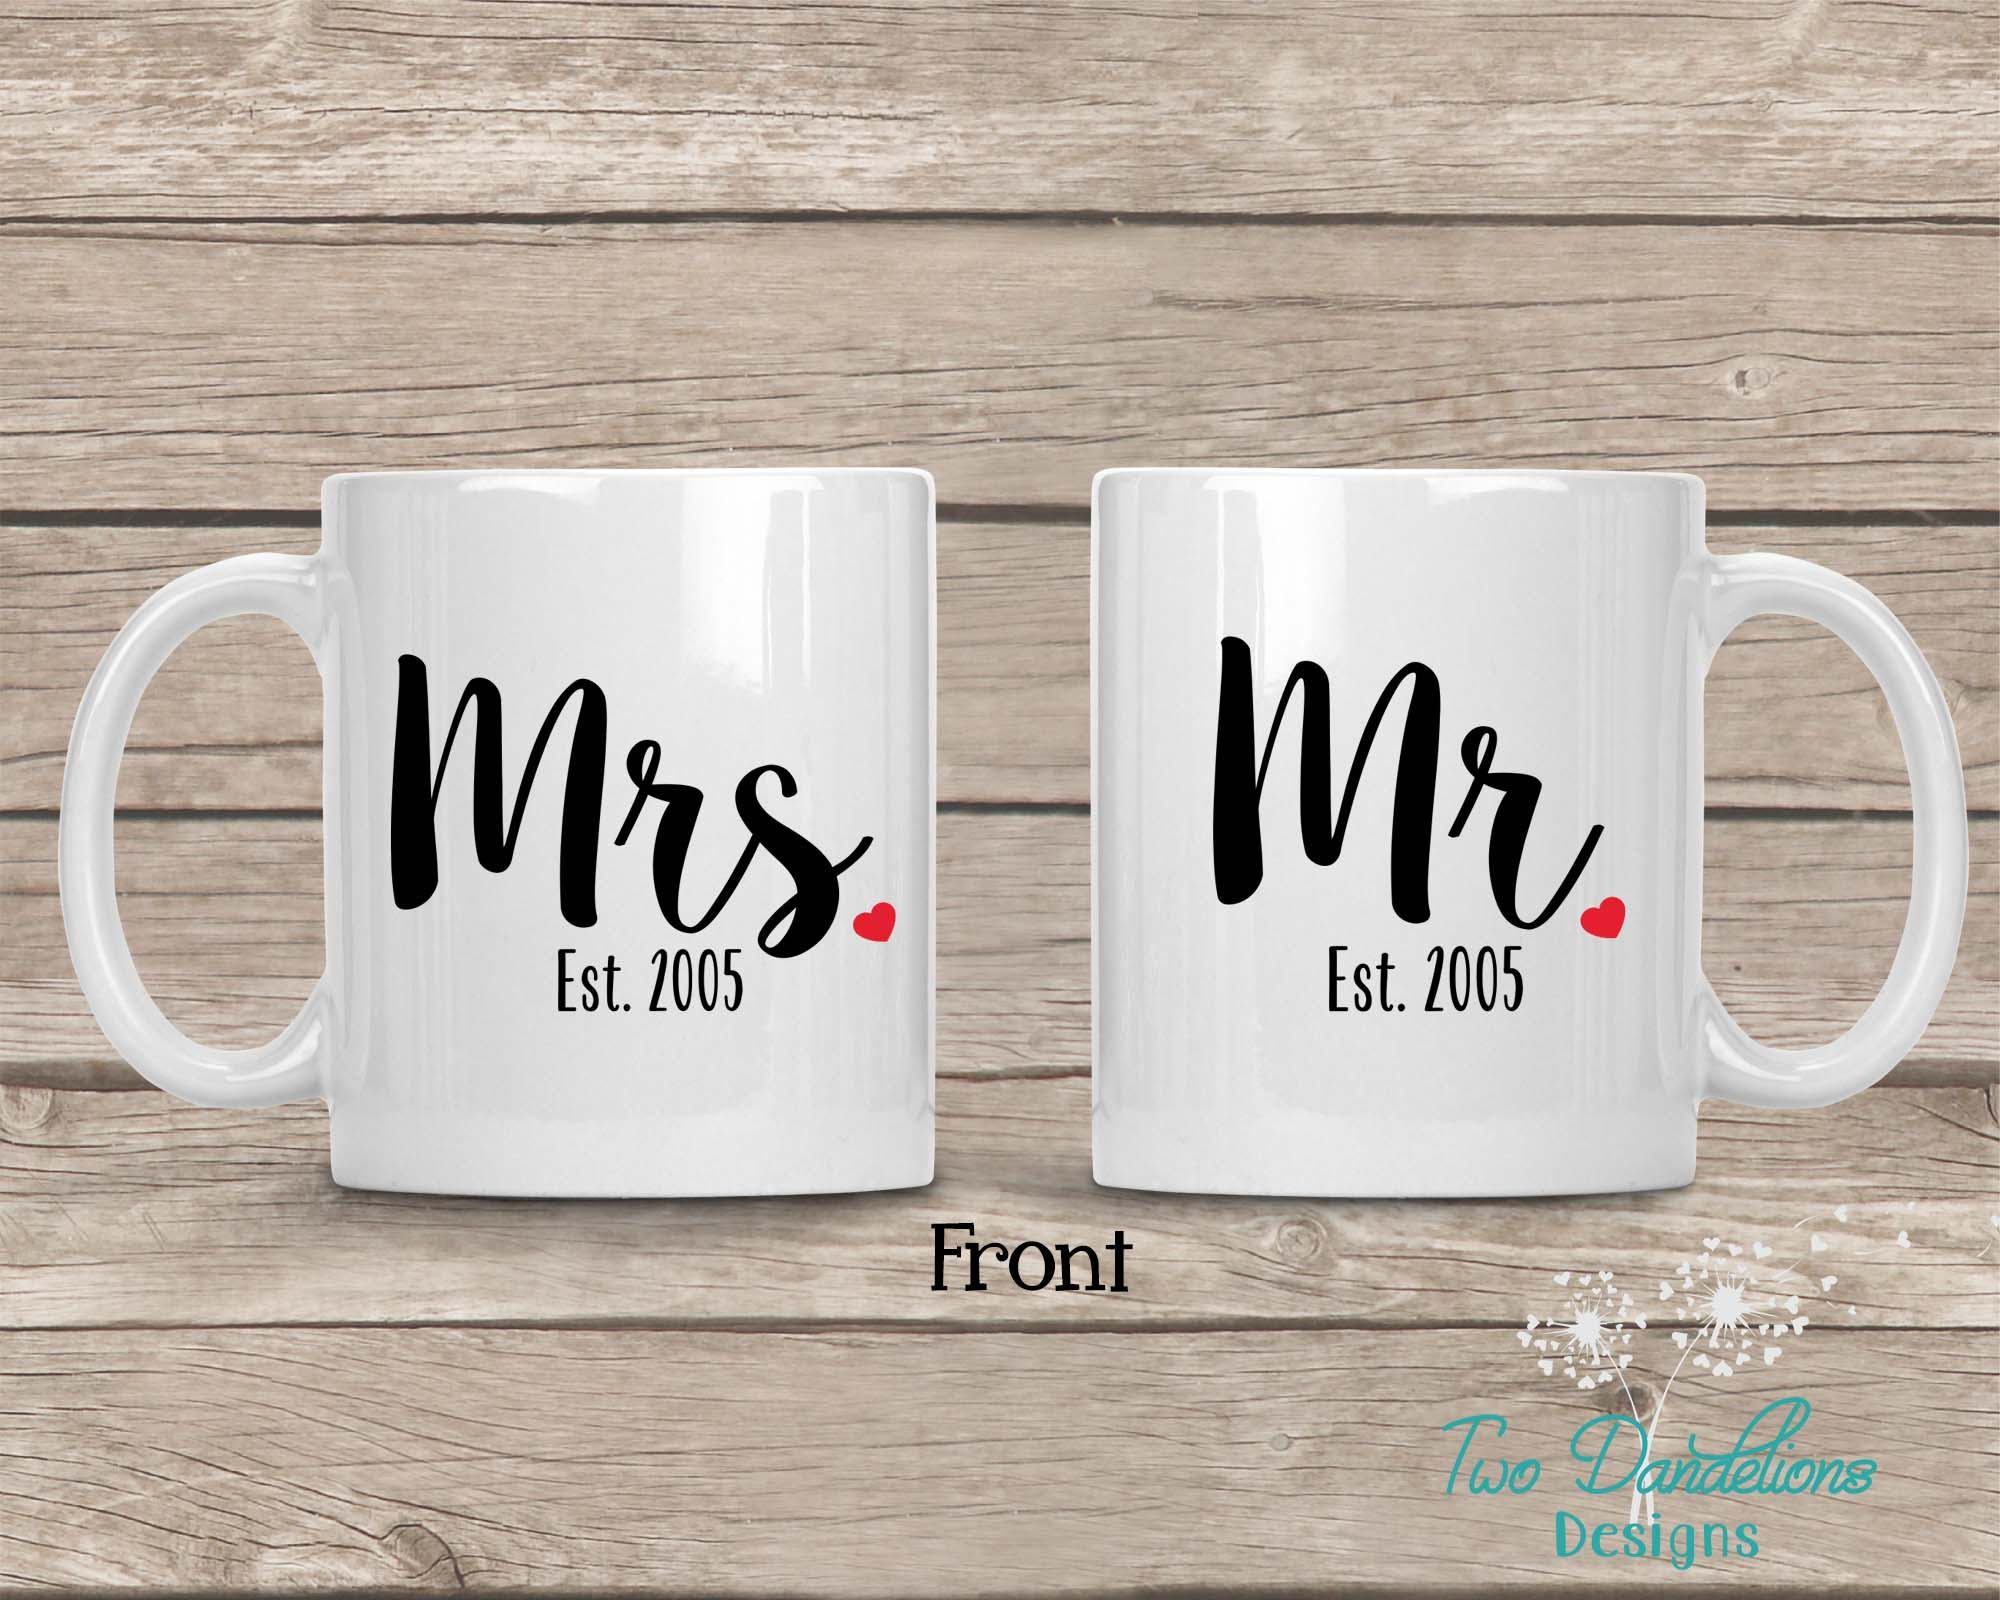 and Mrs Mr Established Coffee Mug Set